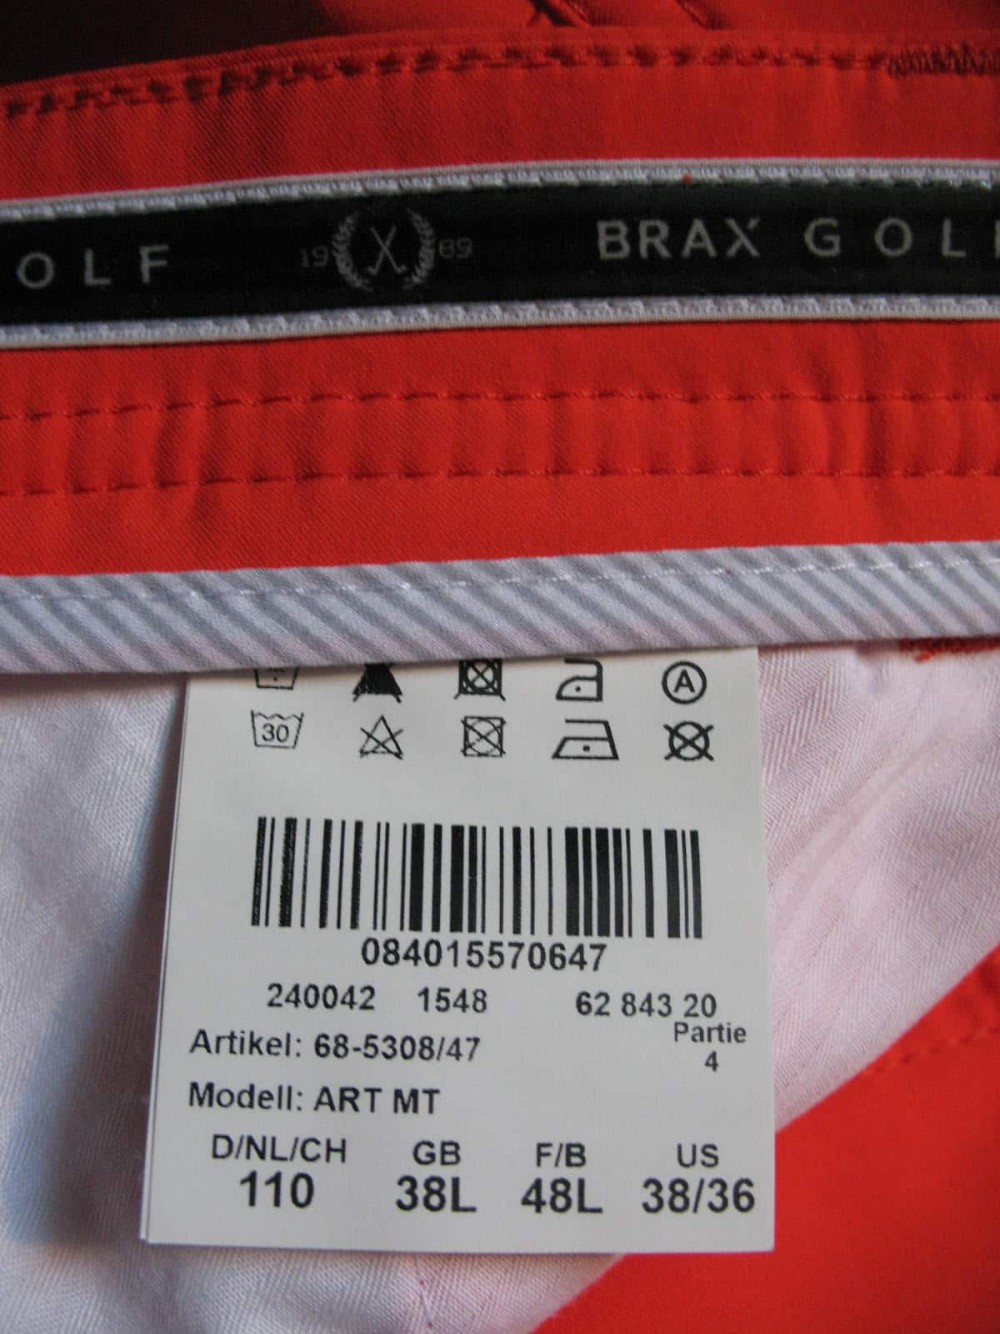 Штаны BRAX golf art mt pants (размер XXL/XL) - 8